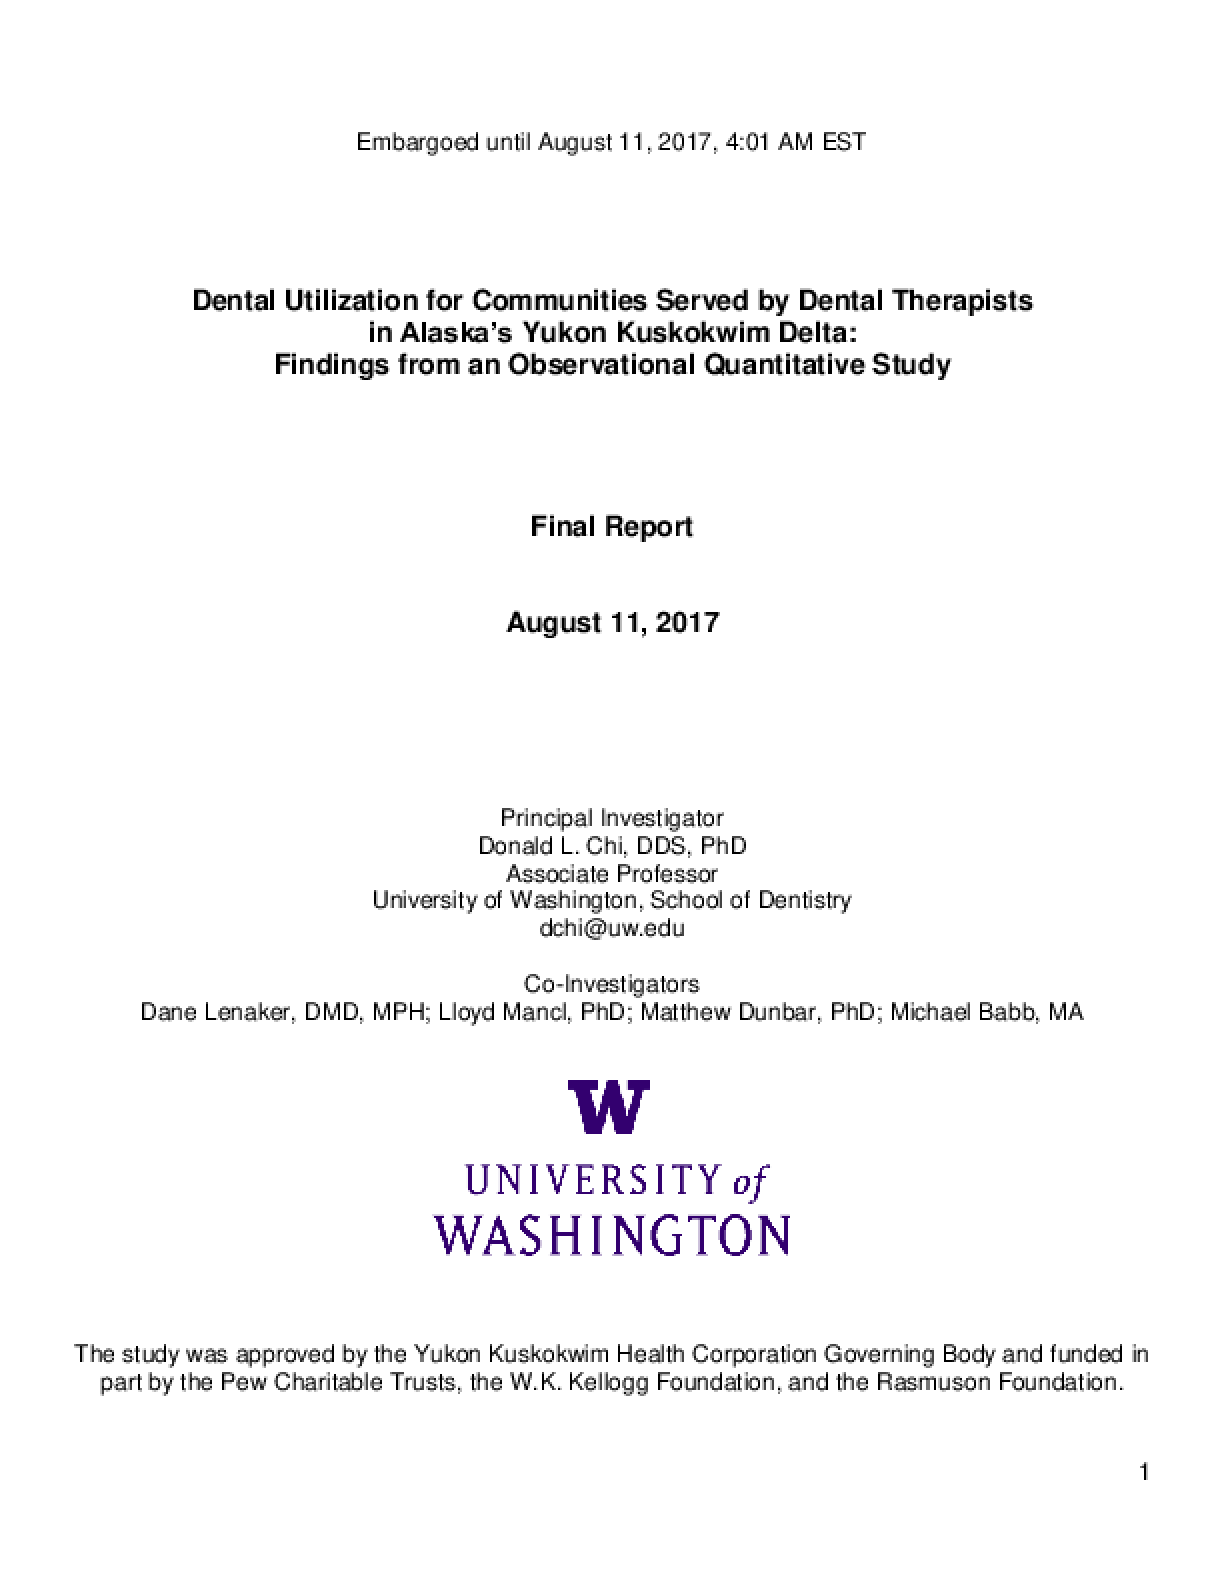 Dental Utilization for Communities Served by Dental Therapists in Alaska's Yukon Kuskokwim Delta: Findings from an Observational Quantitative Study